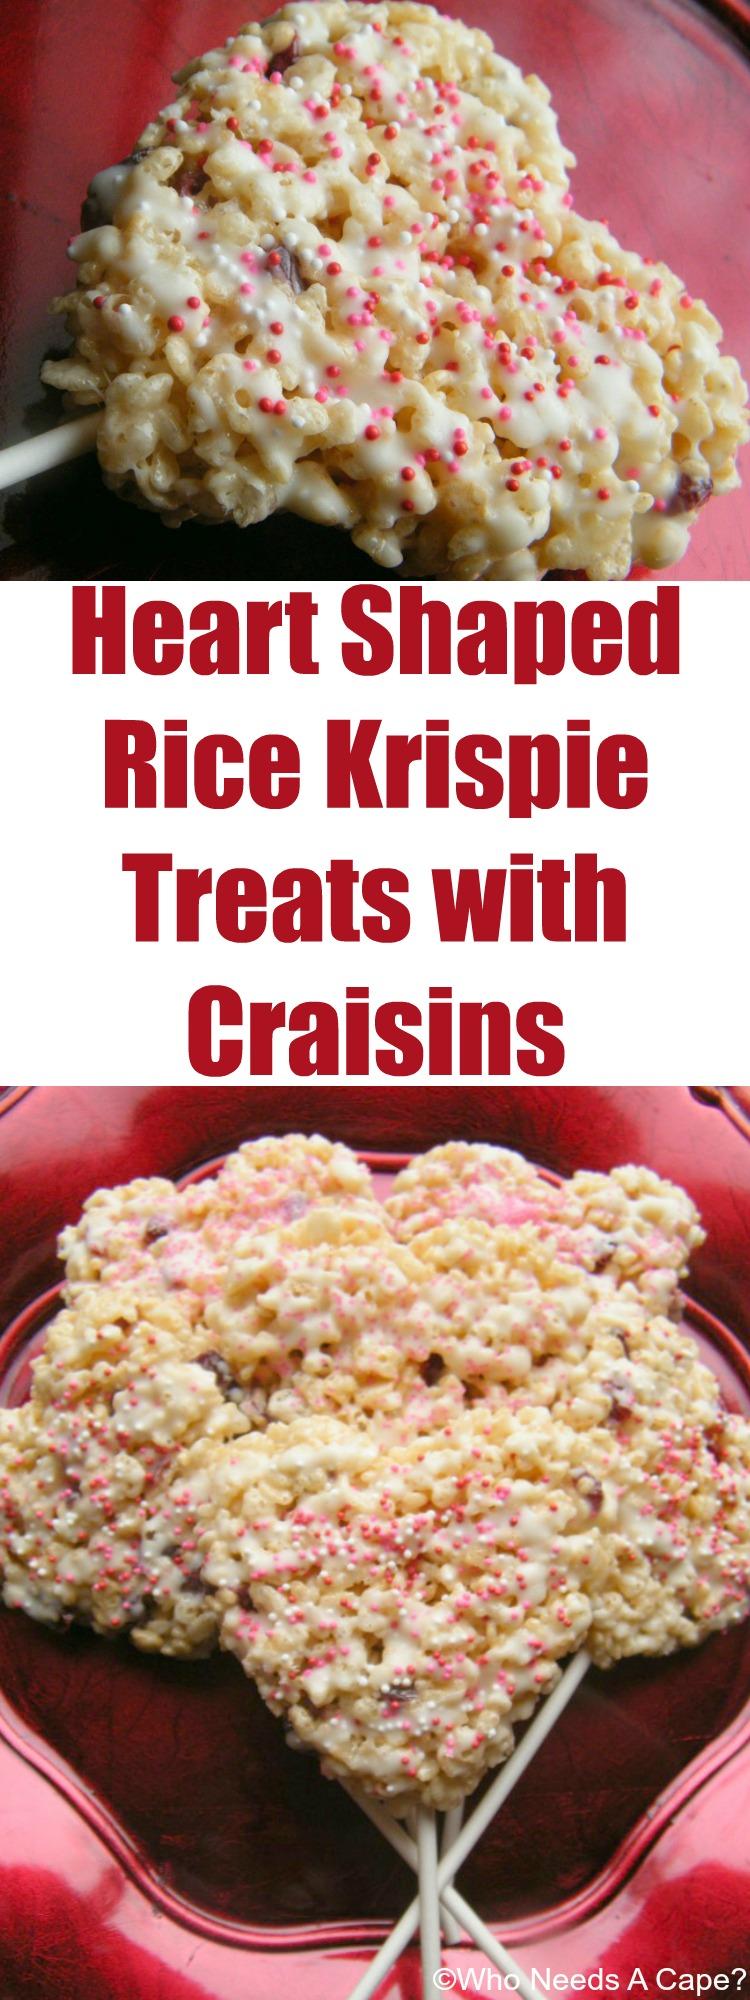 Heart Shaped Rice Krispie Treats with Craisins - Who Needs ...